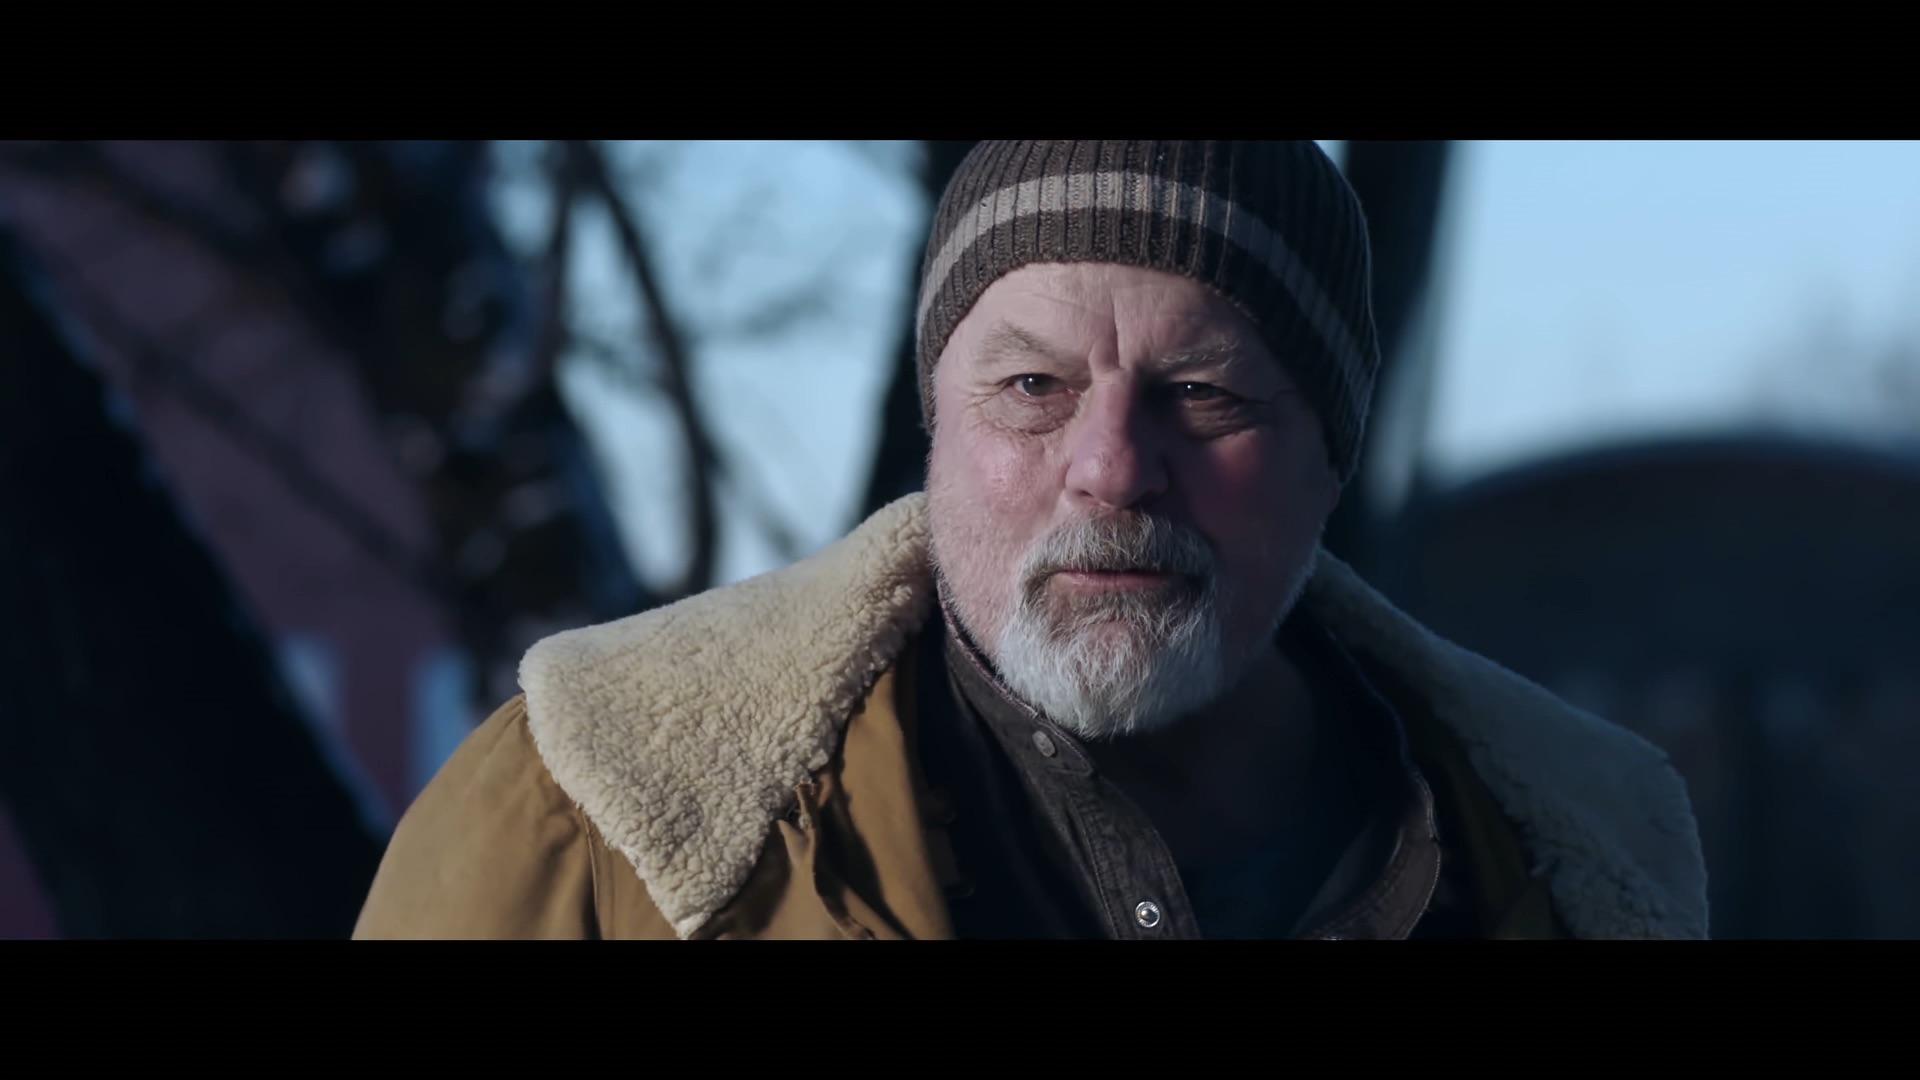 Michael Ironside as Jacob, the secretive, hermit-like granddad in Knuckleball